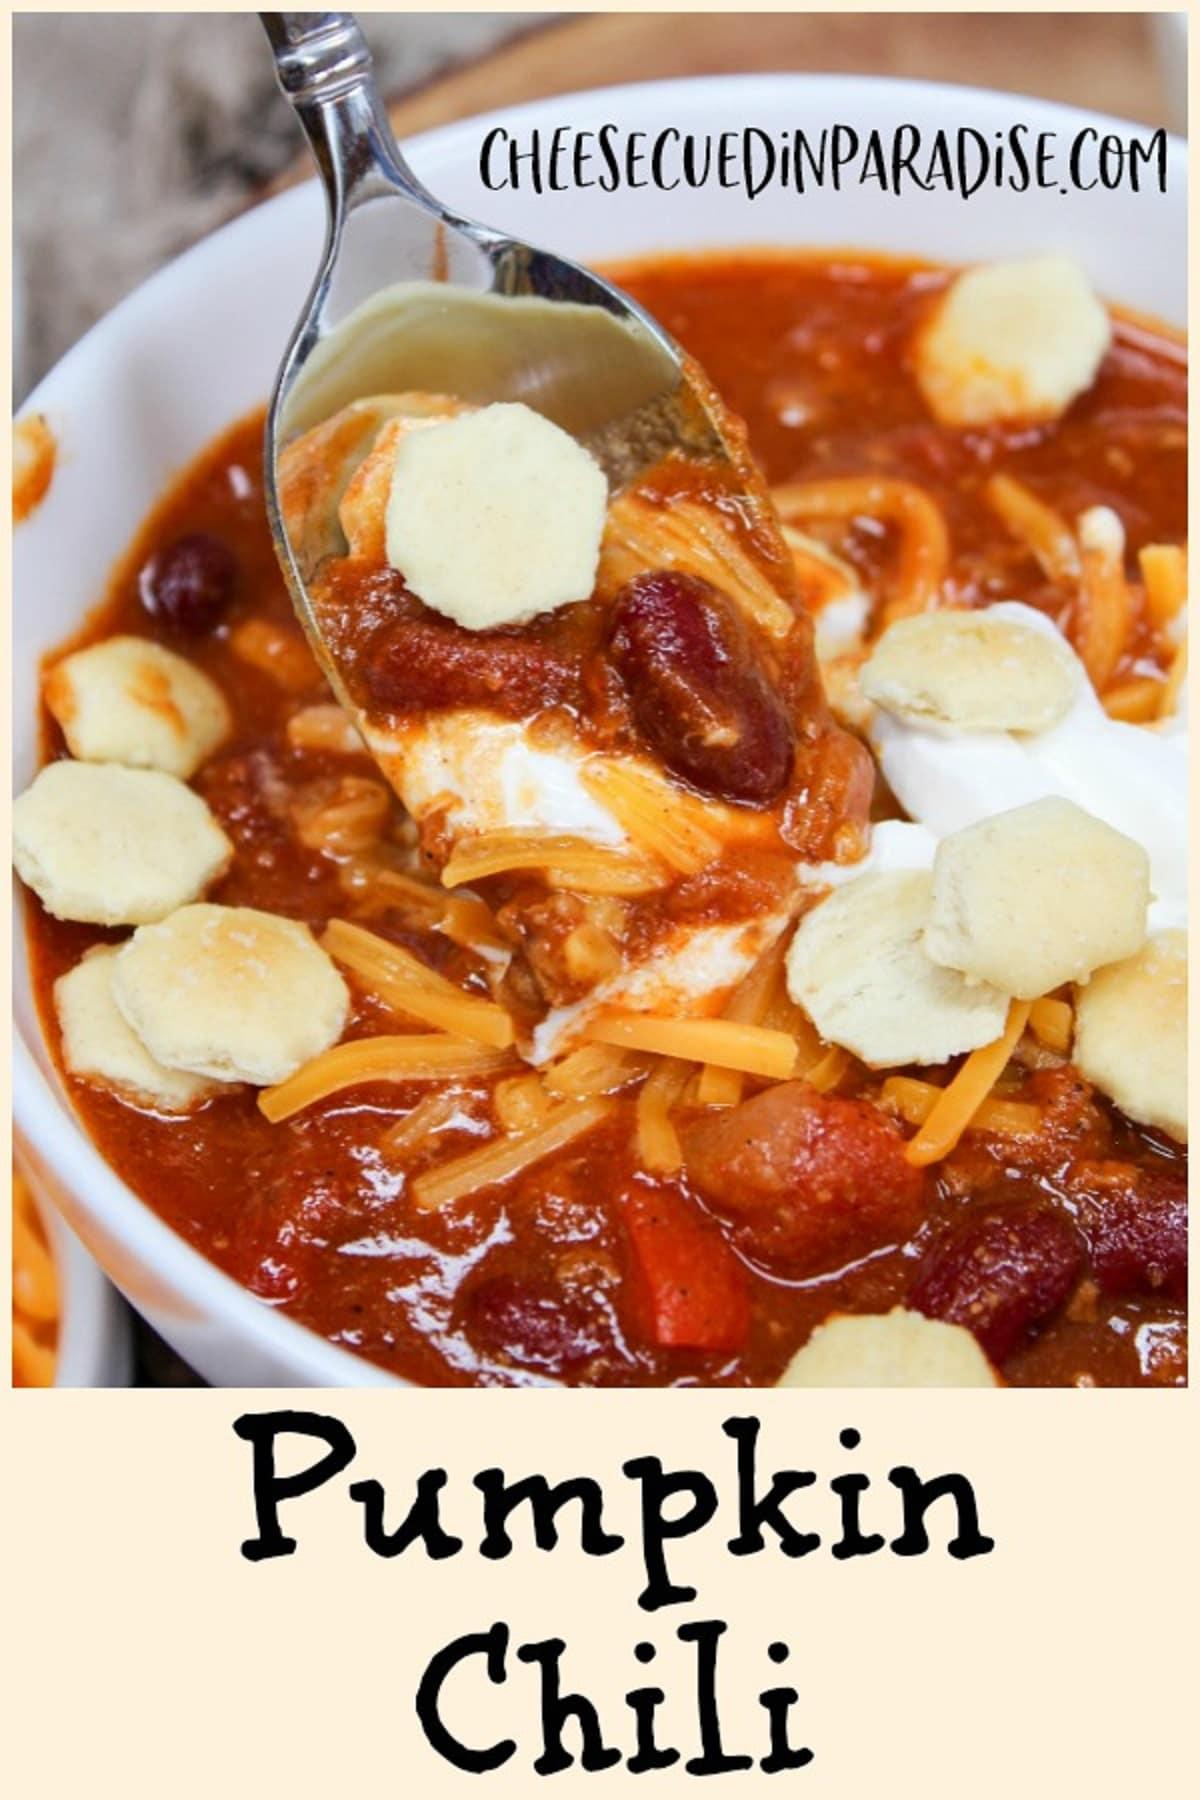 pumpkin chili pin image